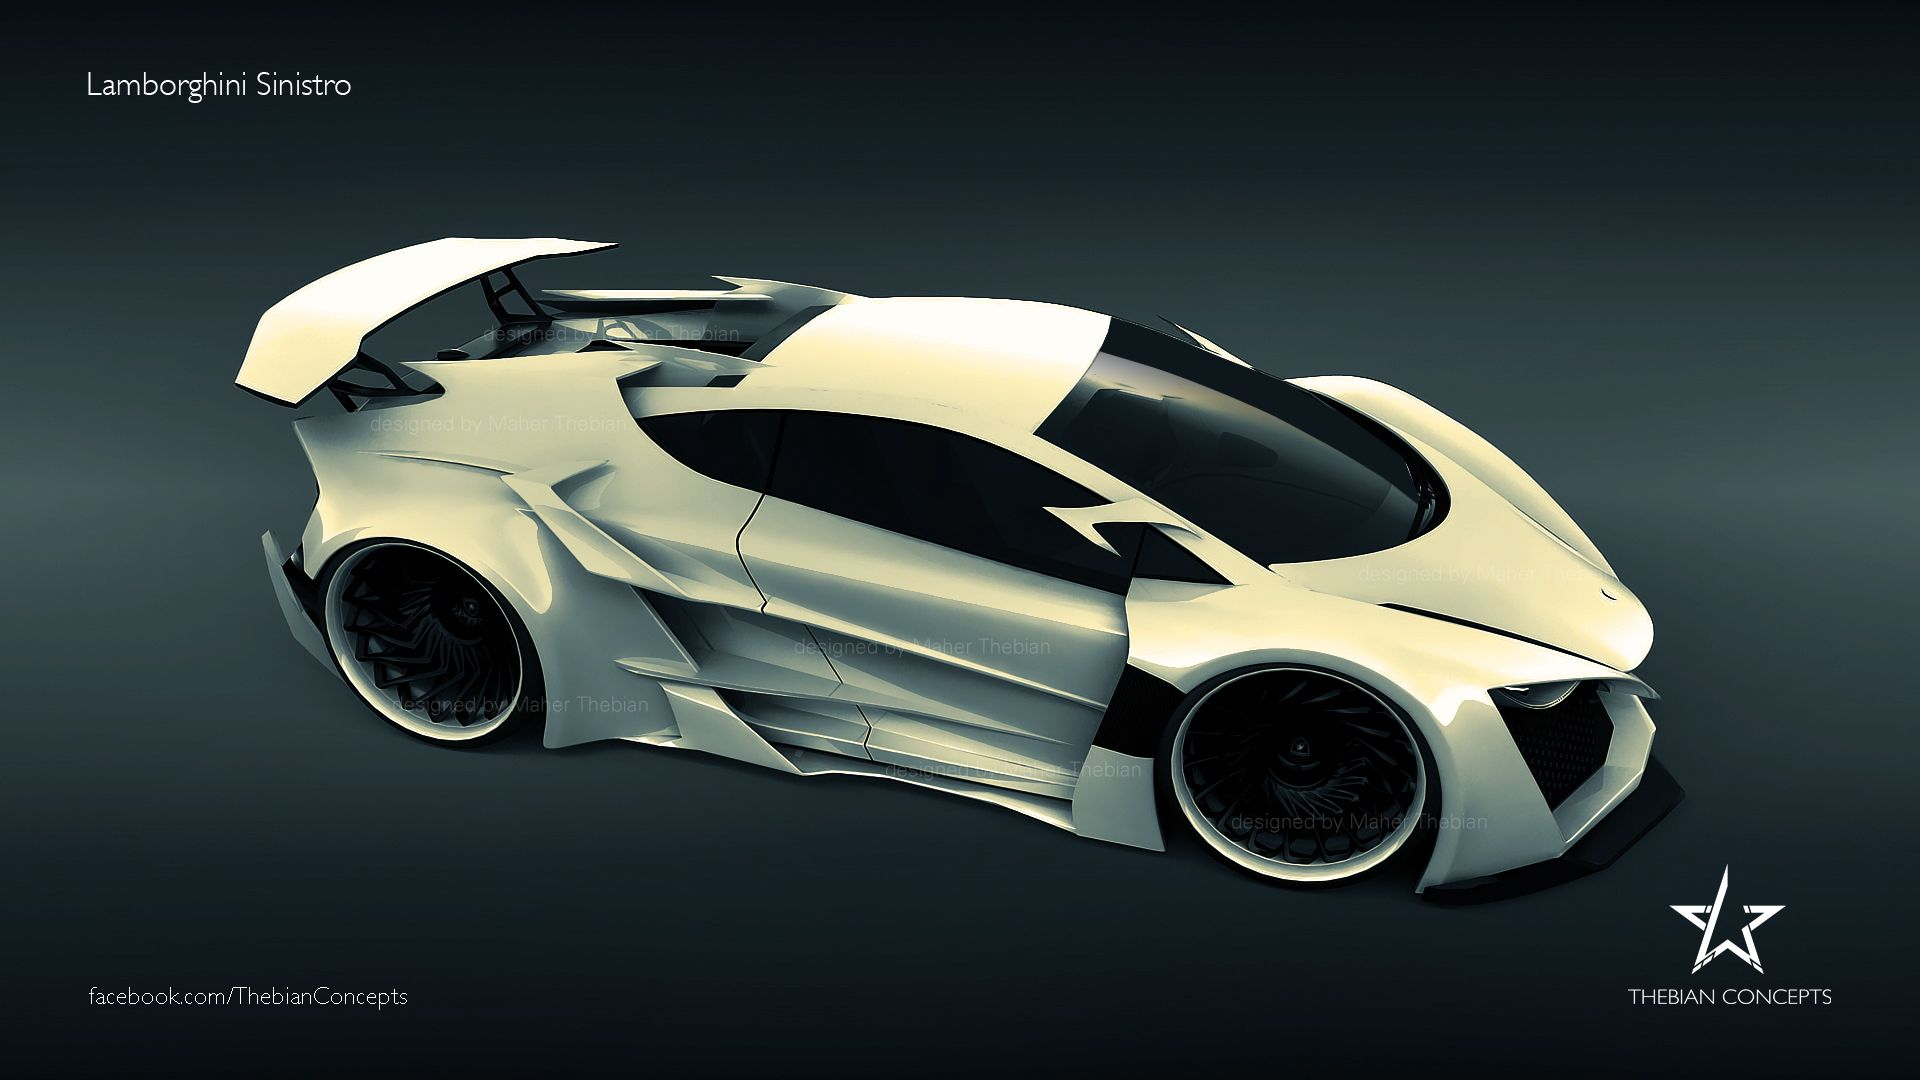 Merveilleux Vehicles   Lamborghini Sinistro   Maher Thebian   Sinistro   Lamborghini  Concept   Thebian Concepts Wallpaper